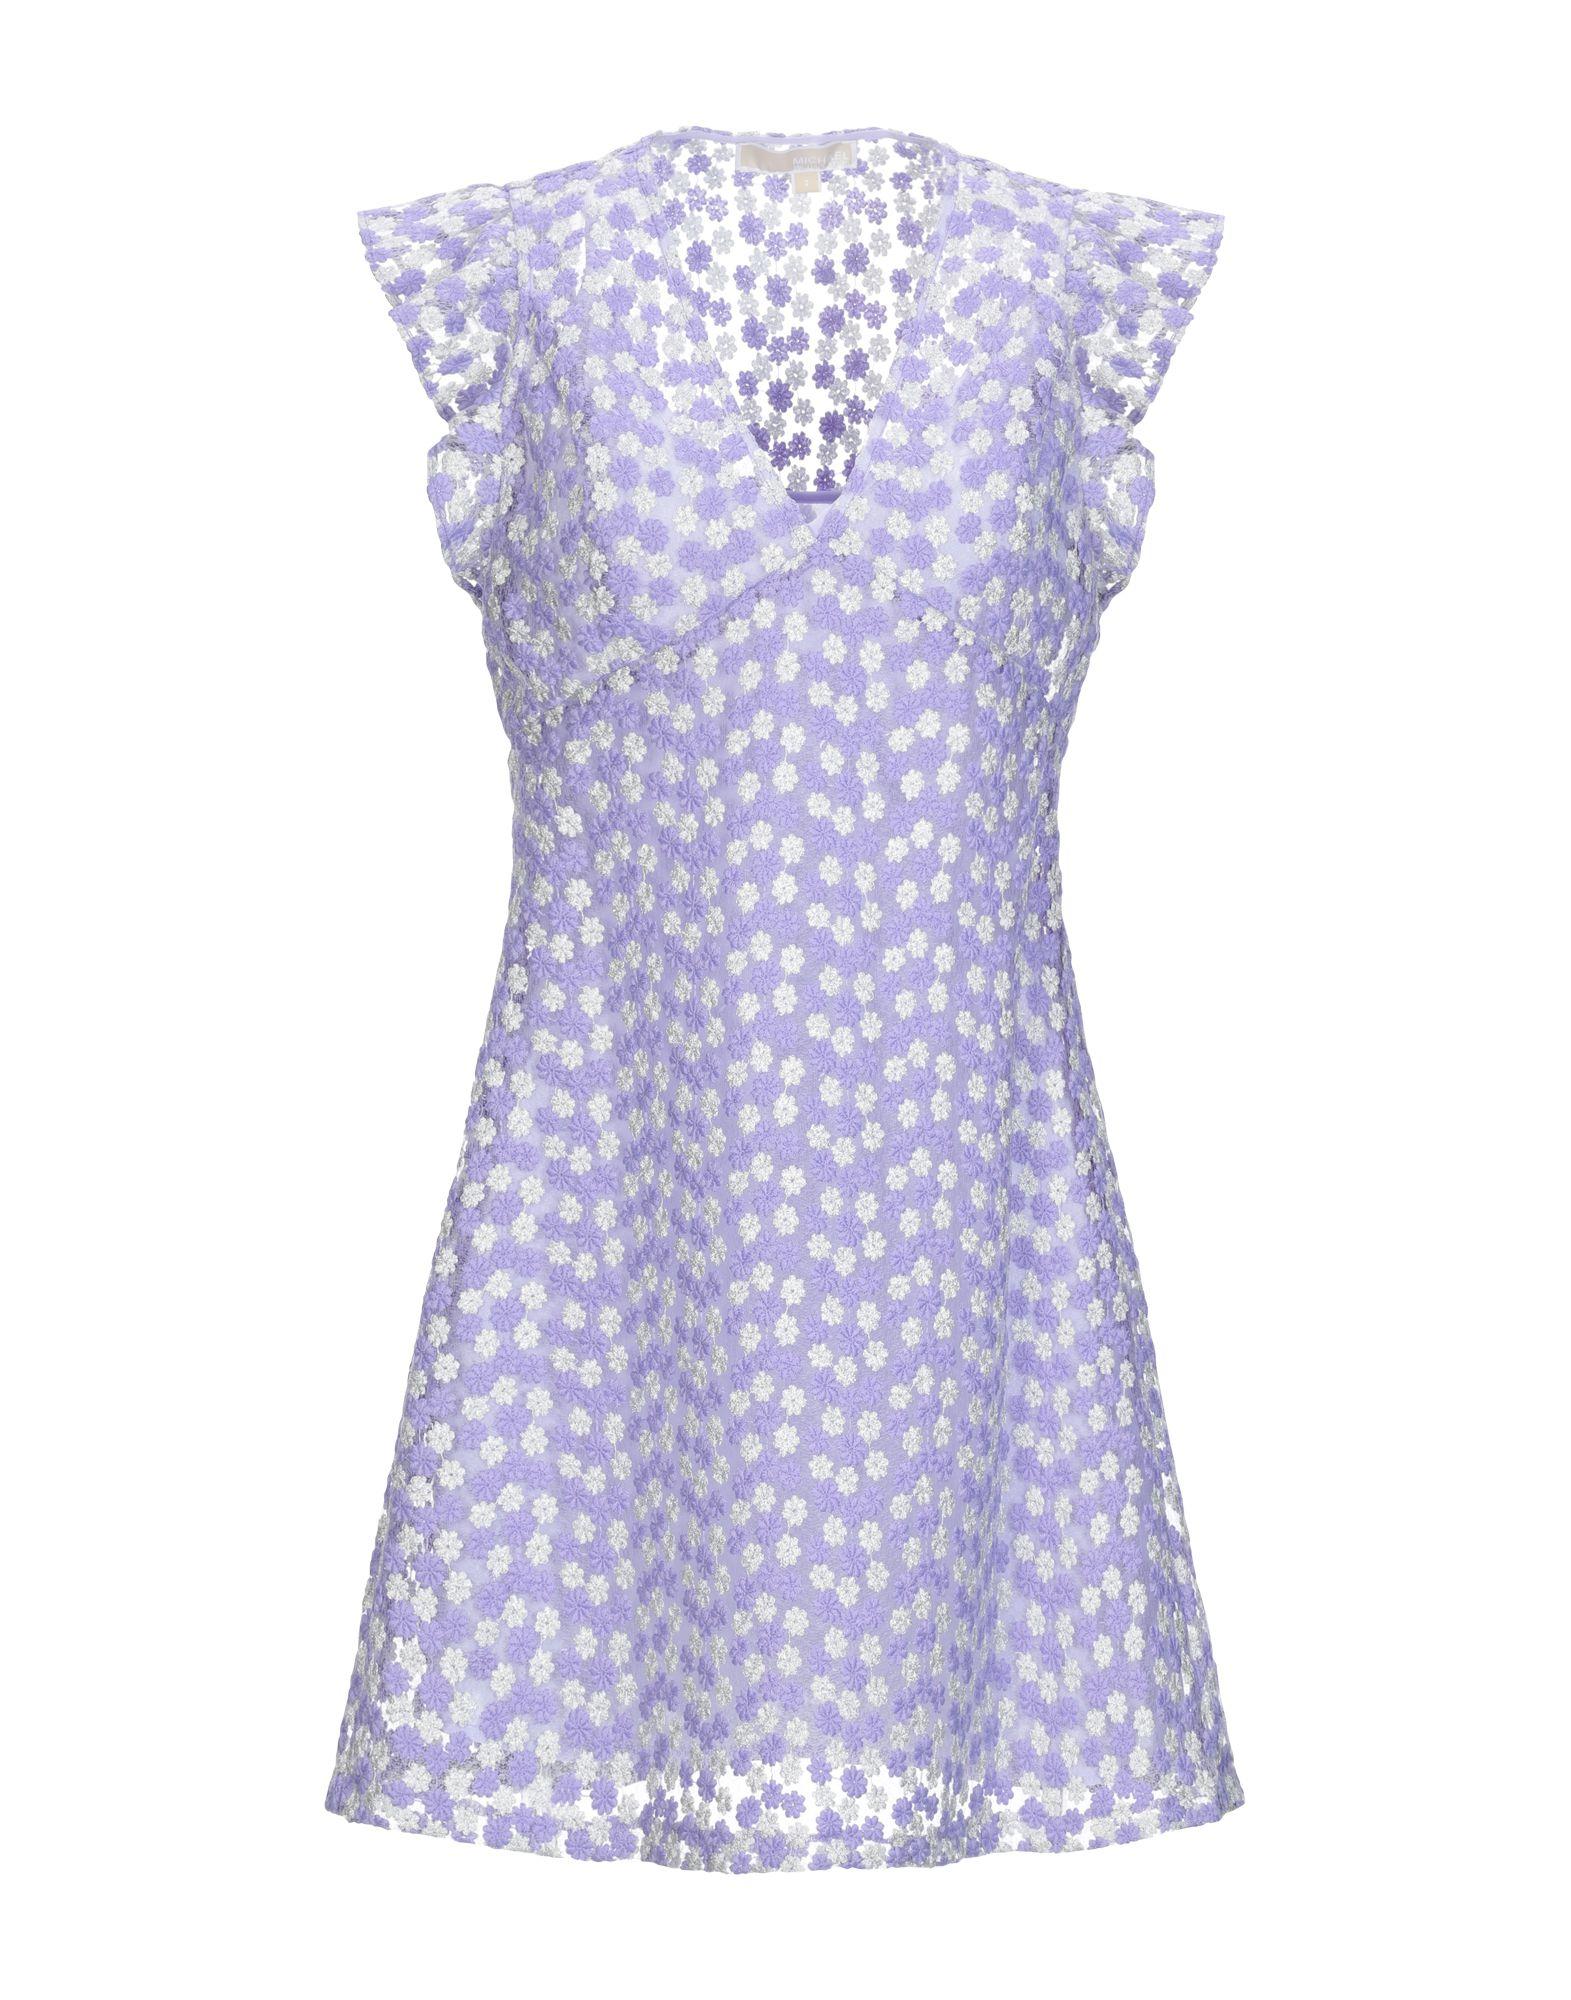 lace, lamé, no appliqués, two-tone, v-neck, sleeveless, no pockets, side closure, zipper closure, fu